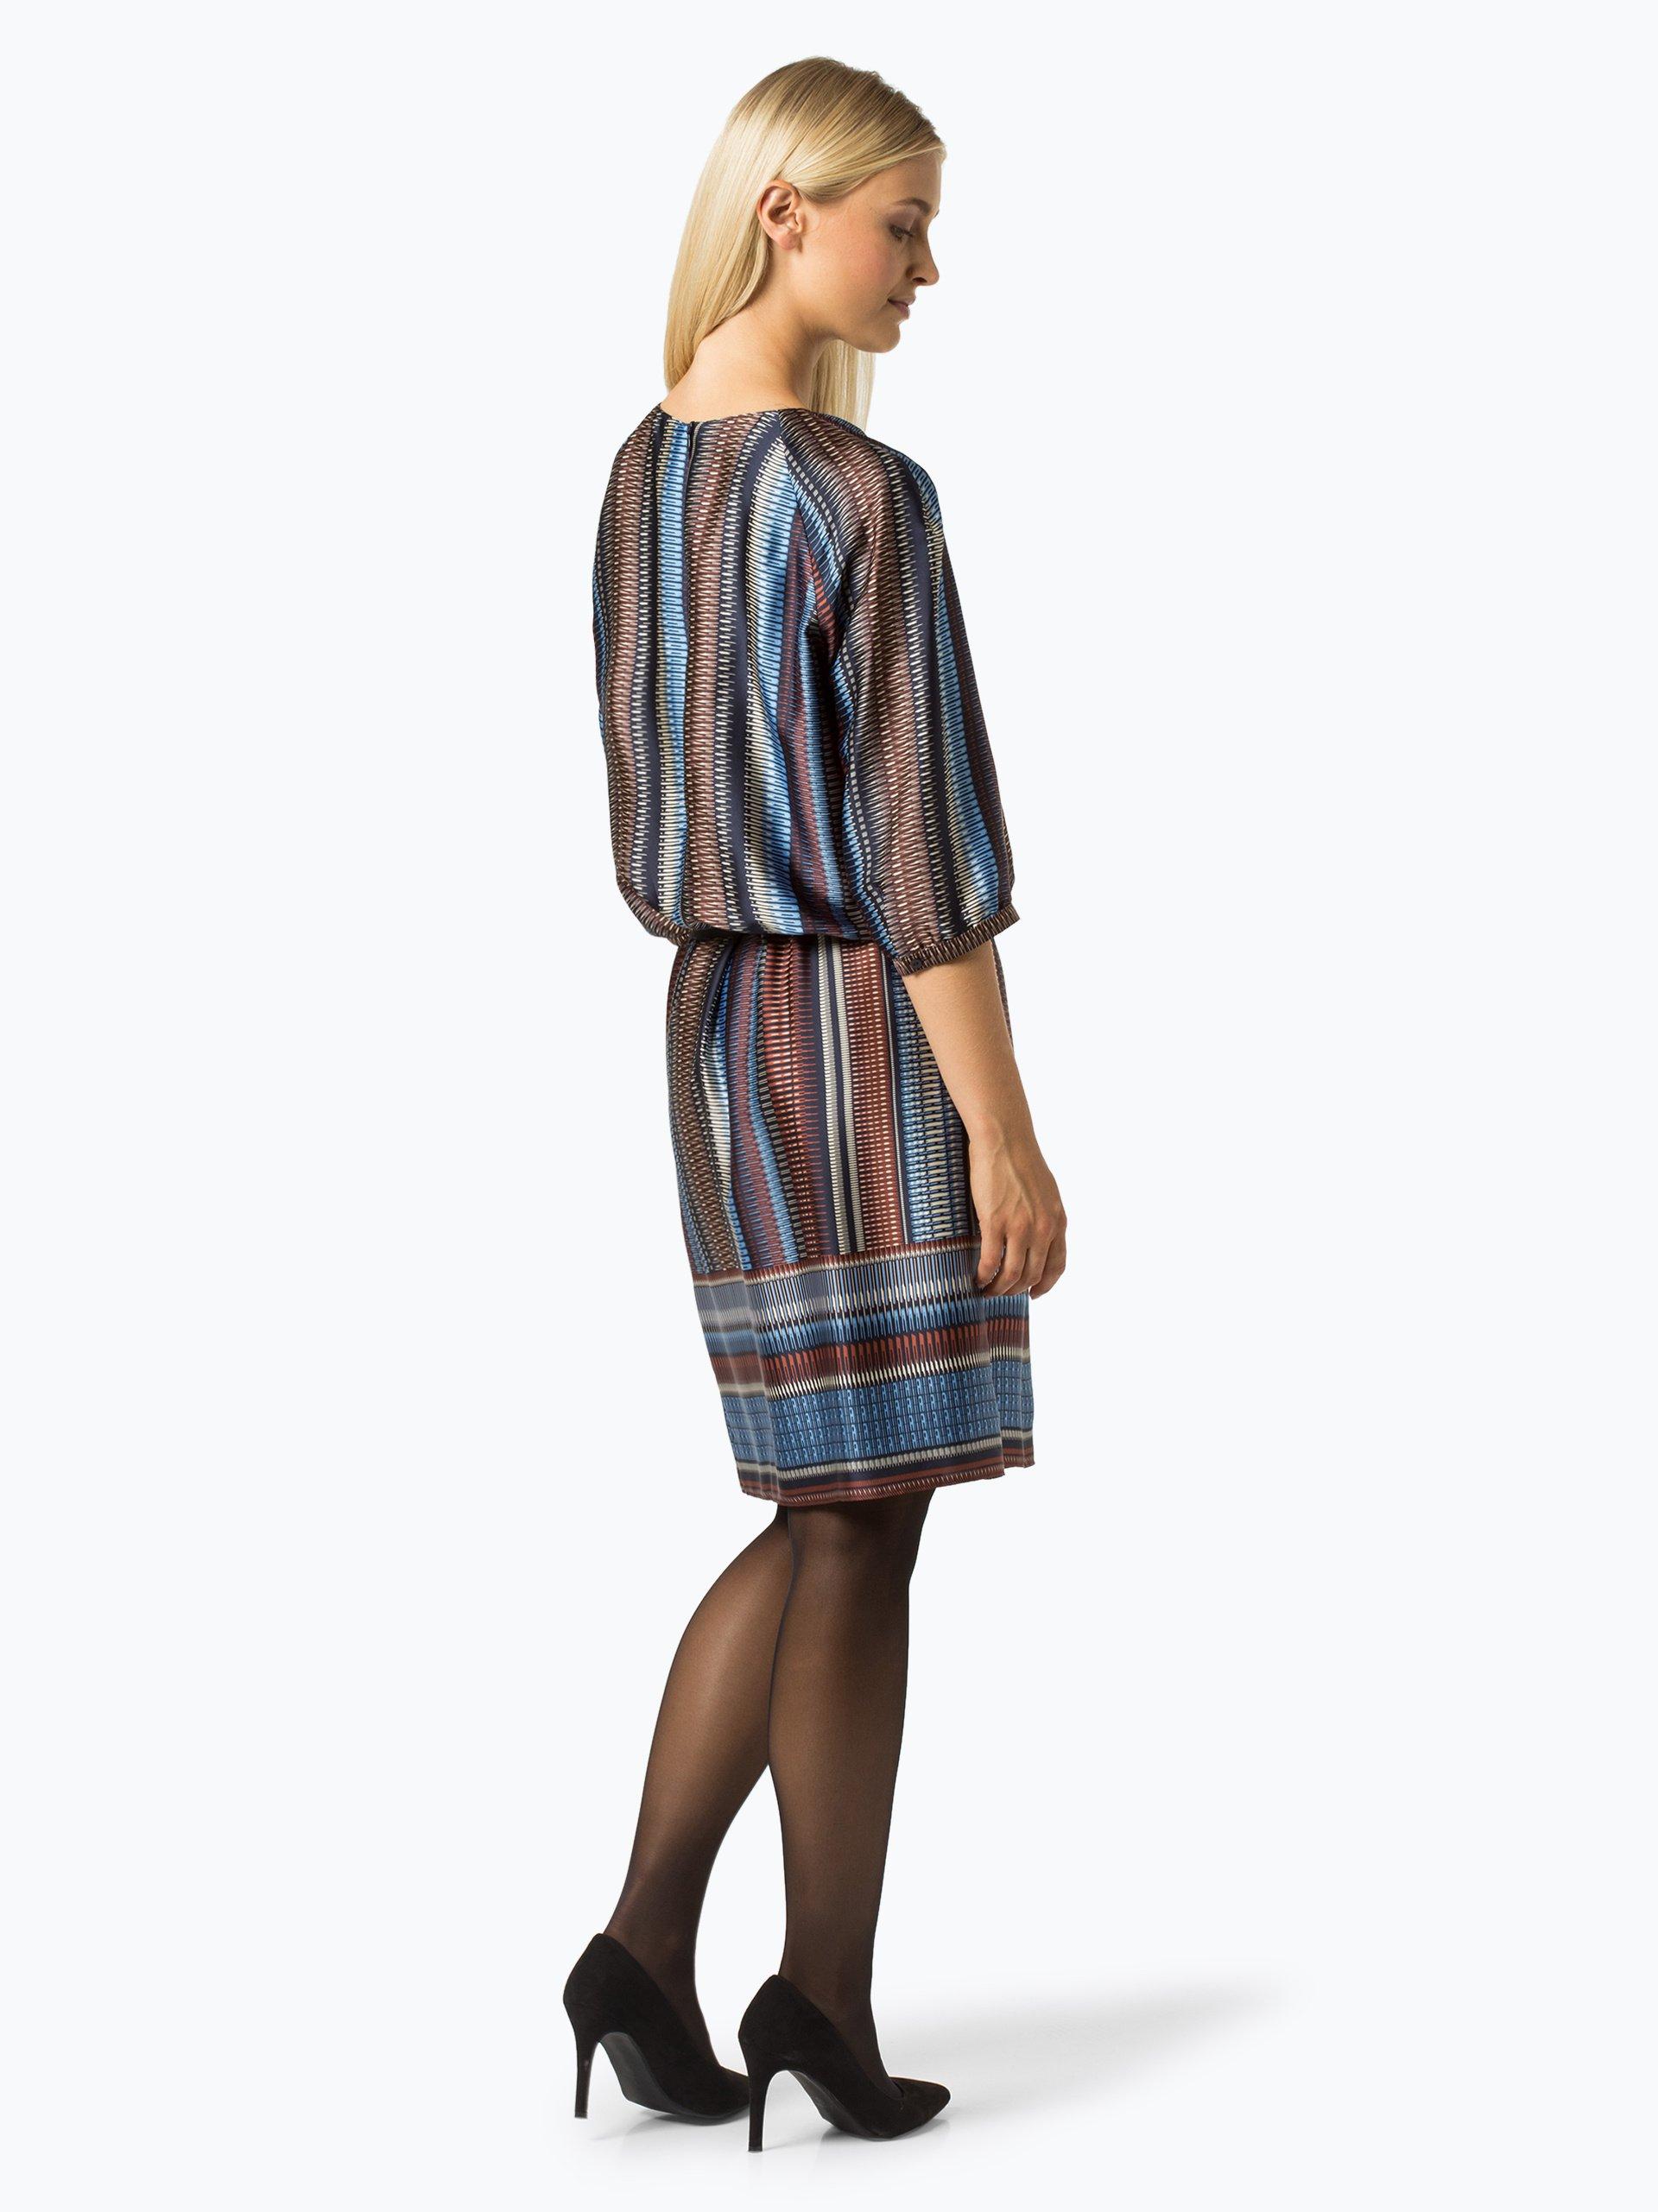 gerry weber damen kleid aqua gemustert online kaufen peek und cloppenburg de. Black Bedroom Furniture Sets. Home Design Ideas